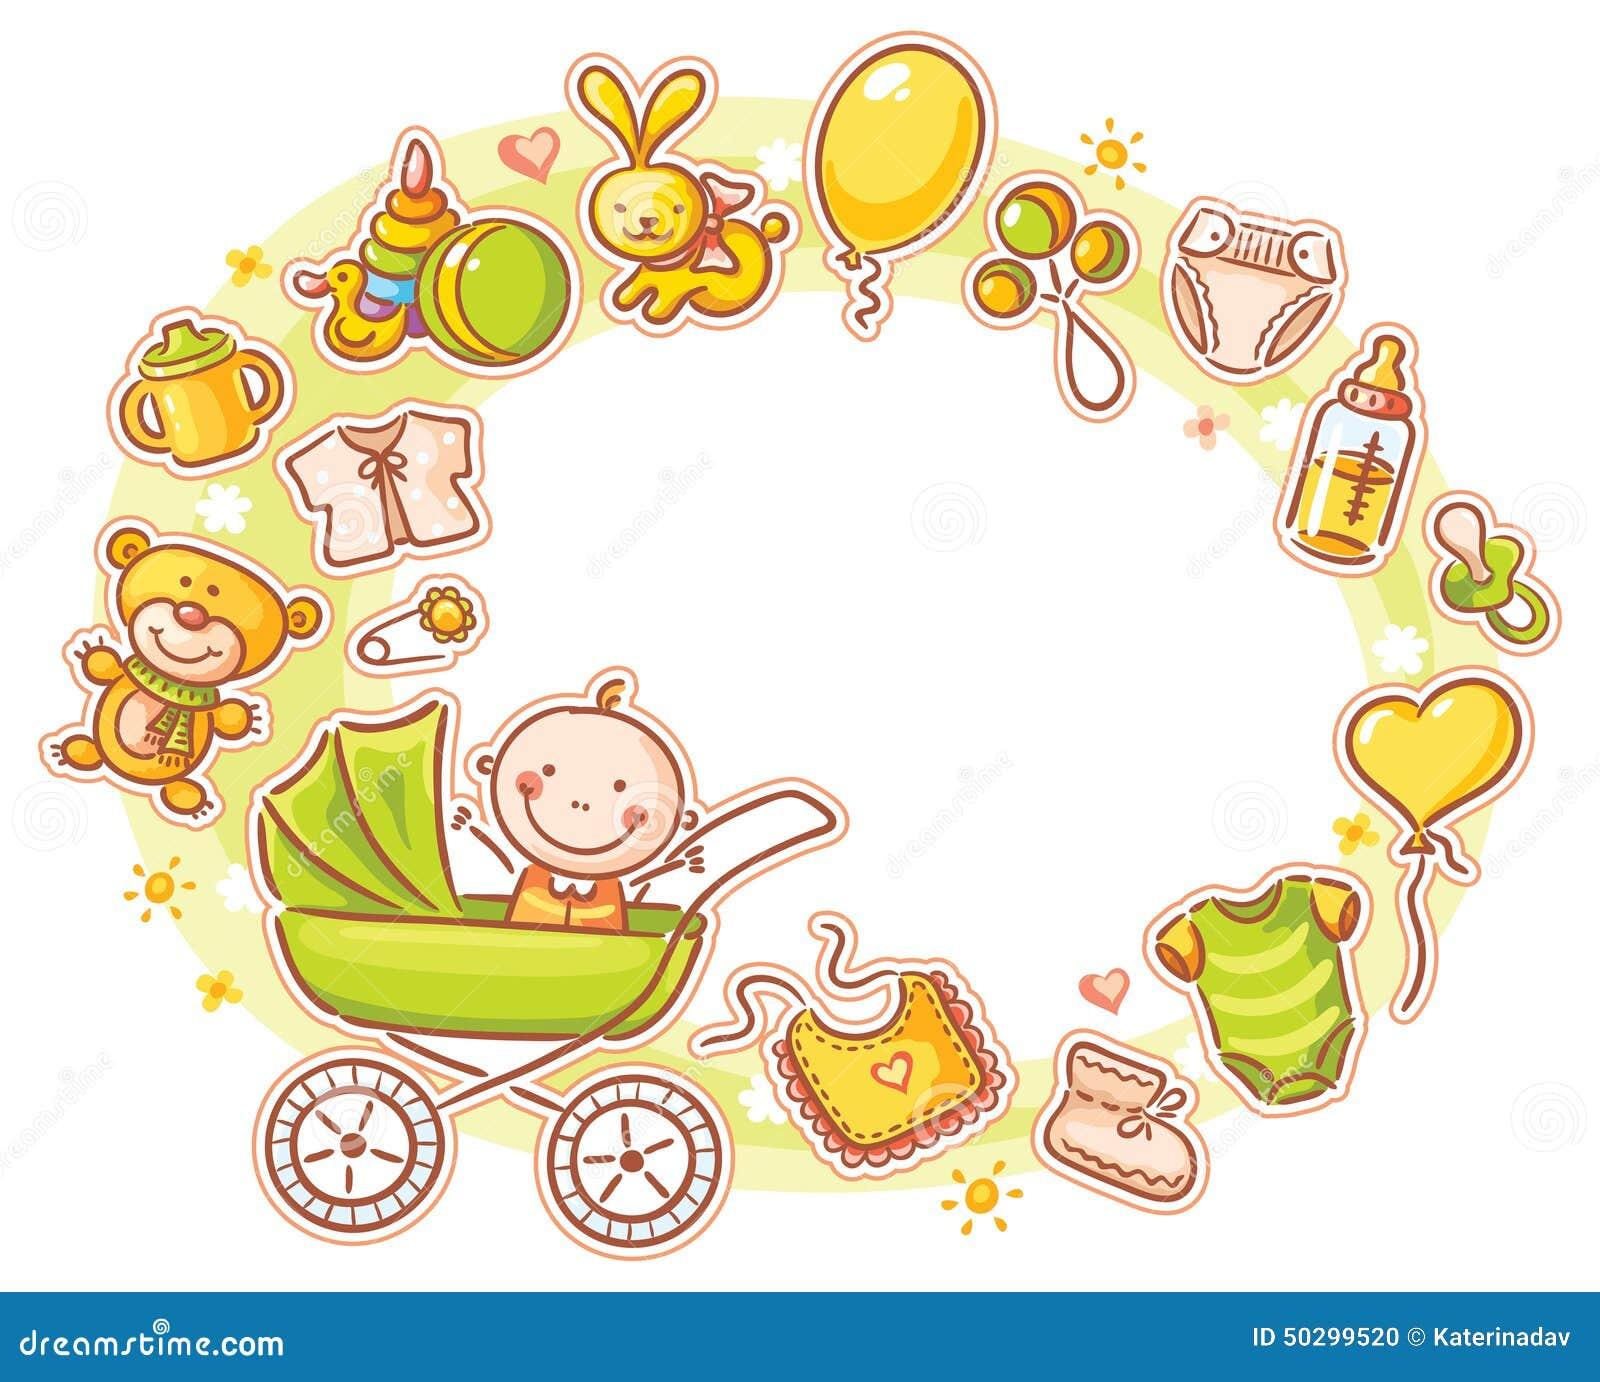 Ovaler Rahmen Mit Karikatur-Baby Vektor Abbildung - Illustration von ...